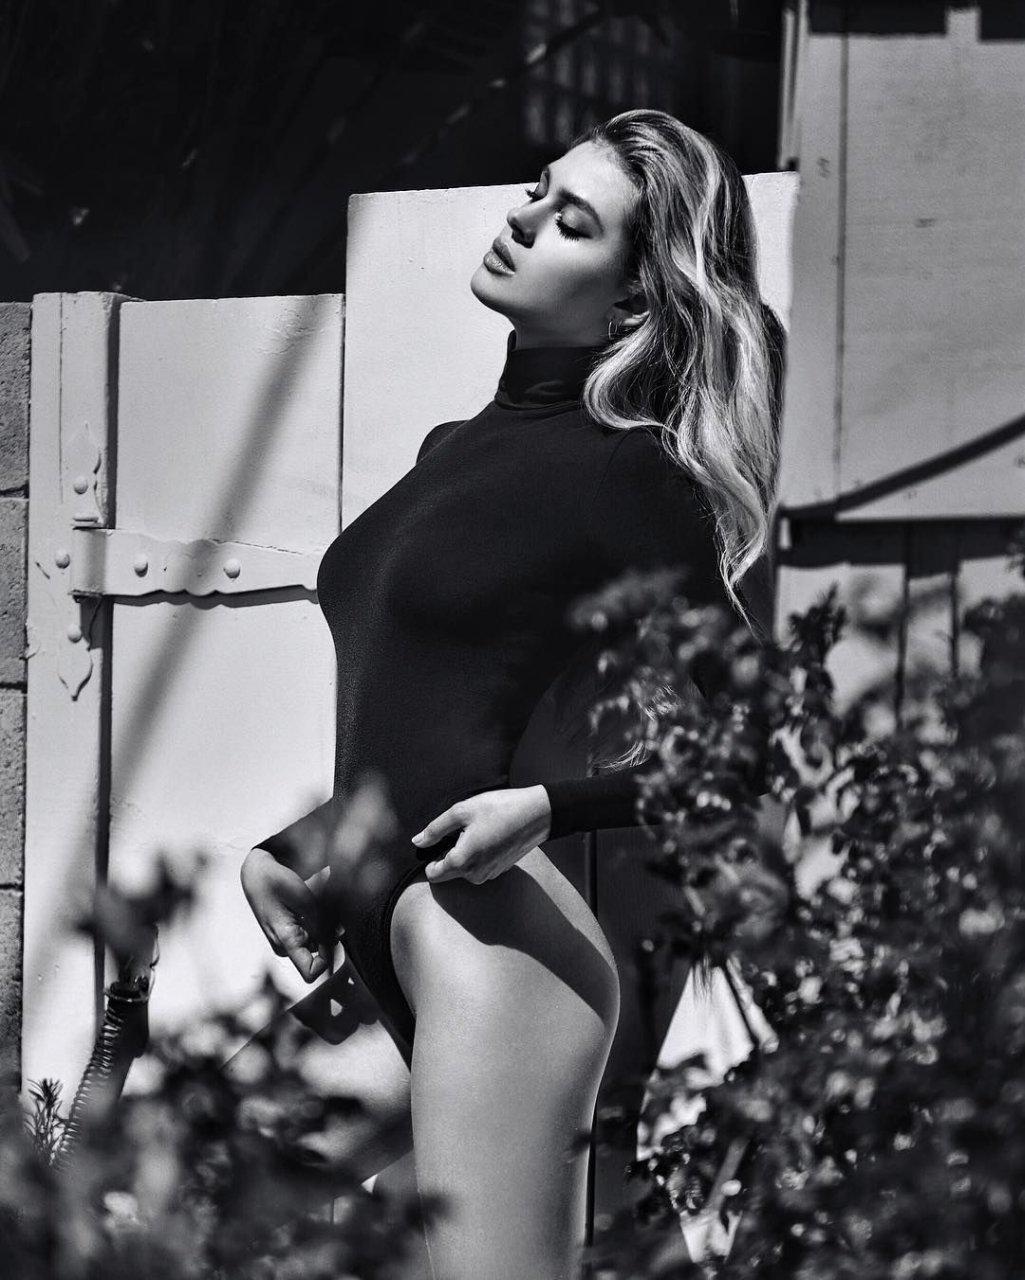 The hottest nicola peltz bikini pictures